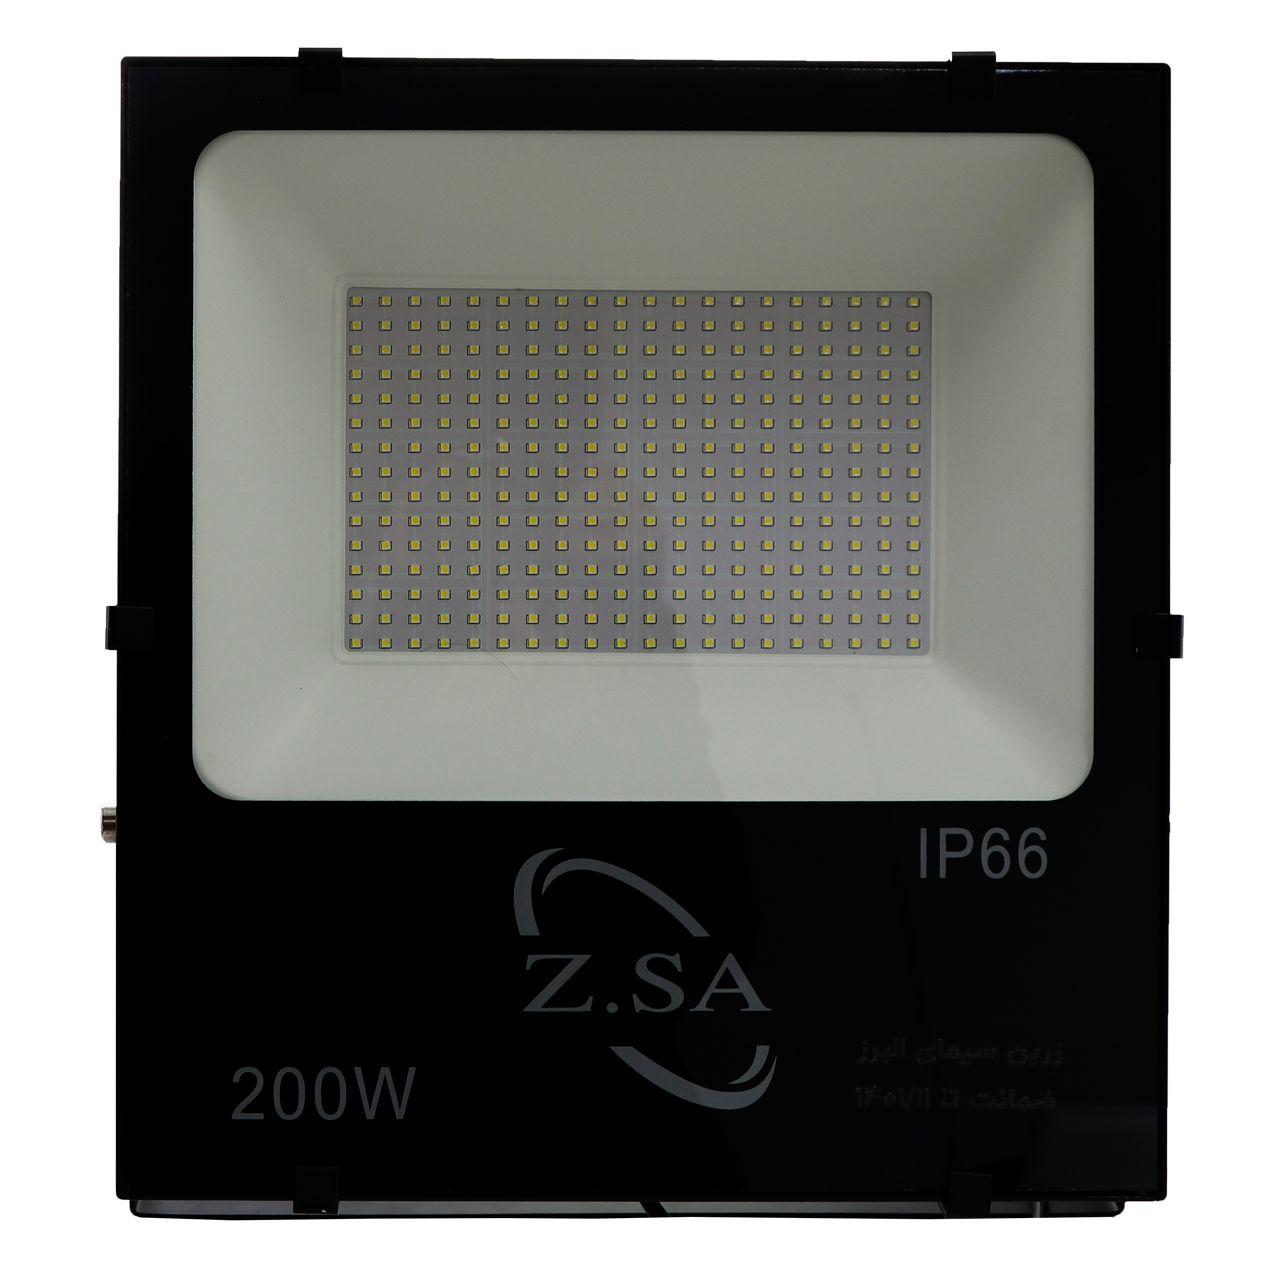 پرژکتور 200 وات زرین سیمای البرز کد IP66_S